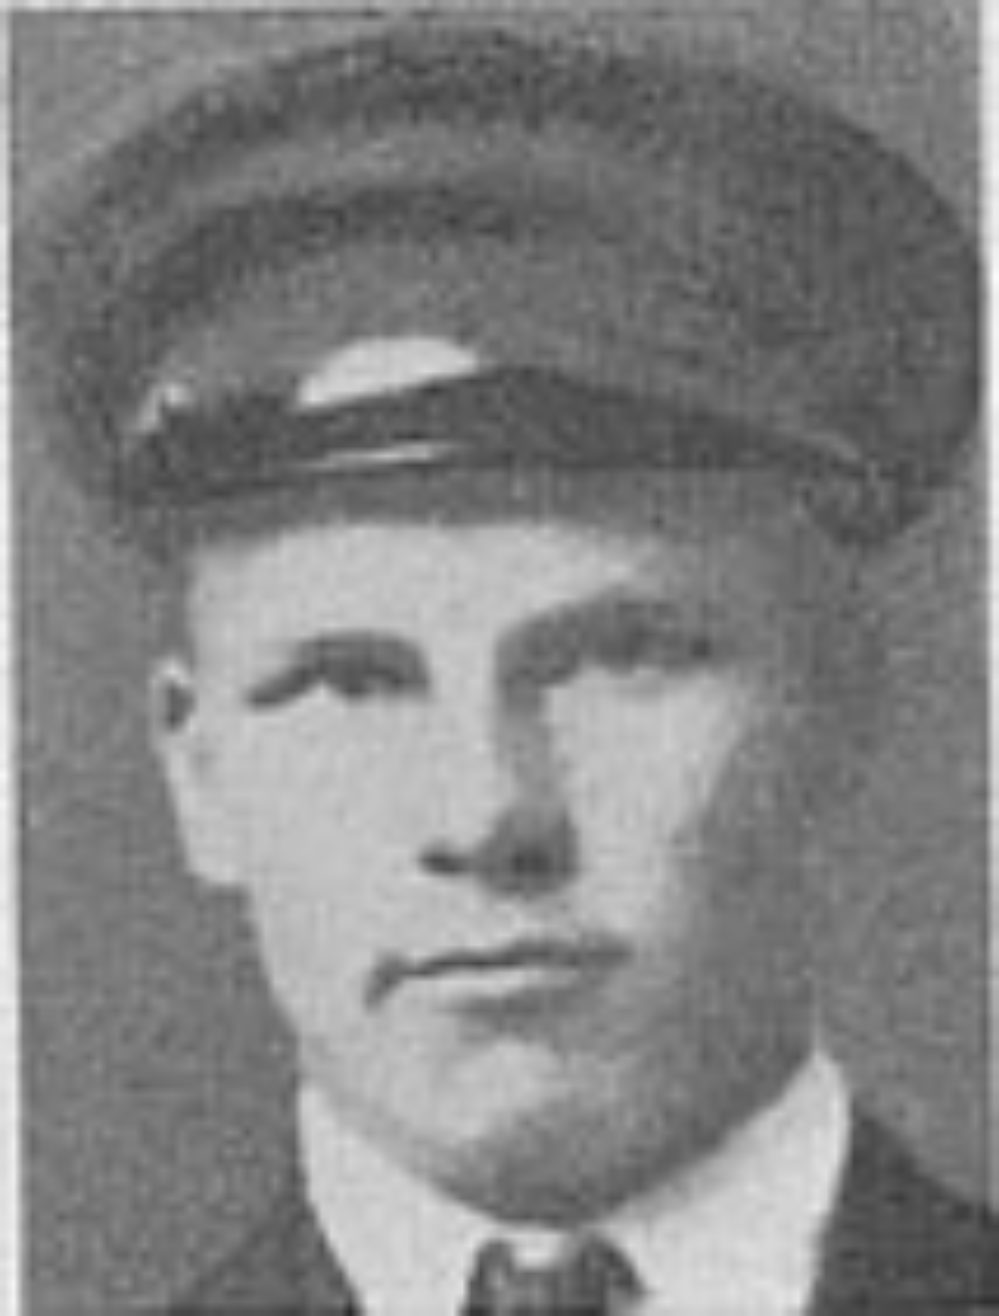 Andreas Leonhard Larsen